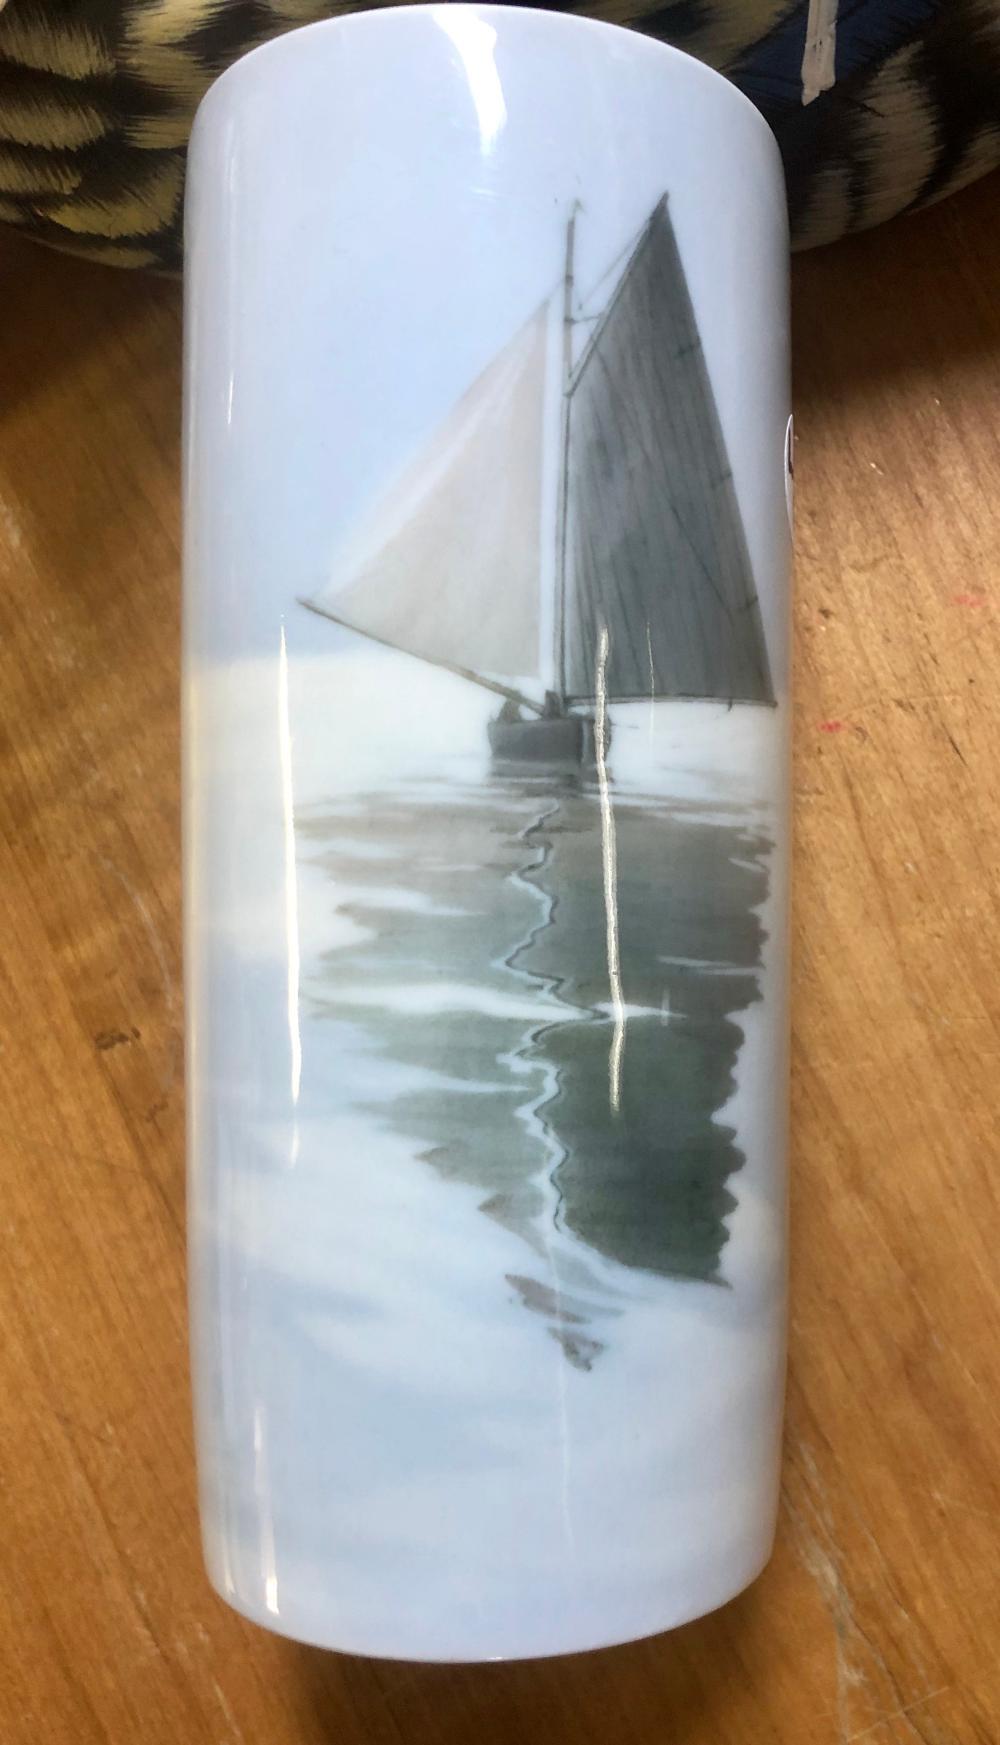 Lot 9: RARE ROYAL COPENHAGEN VASE WITH SAILBOAT ON OCEAN SCENE #4645/62B